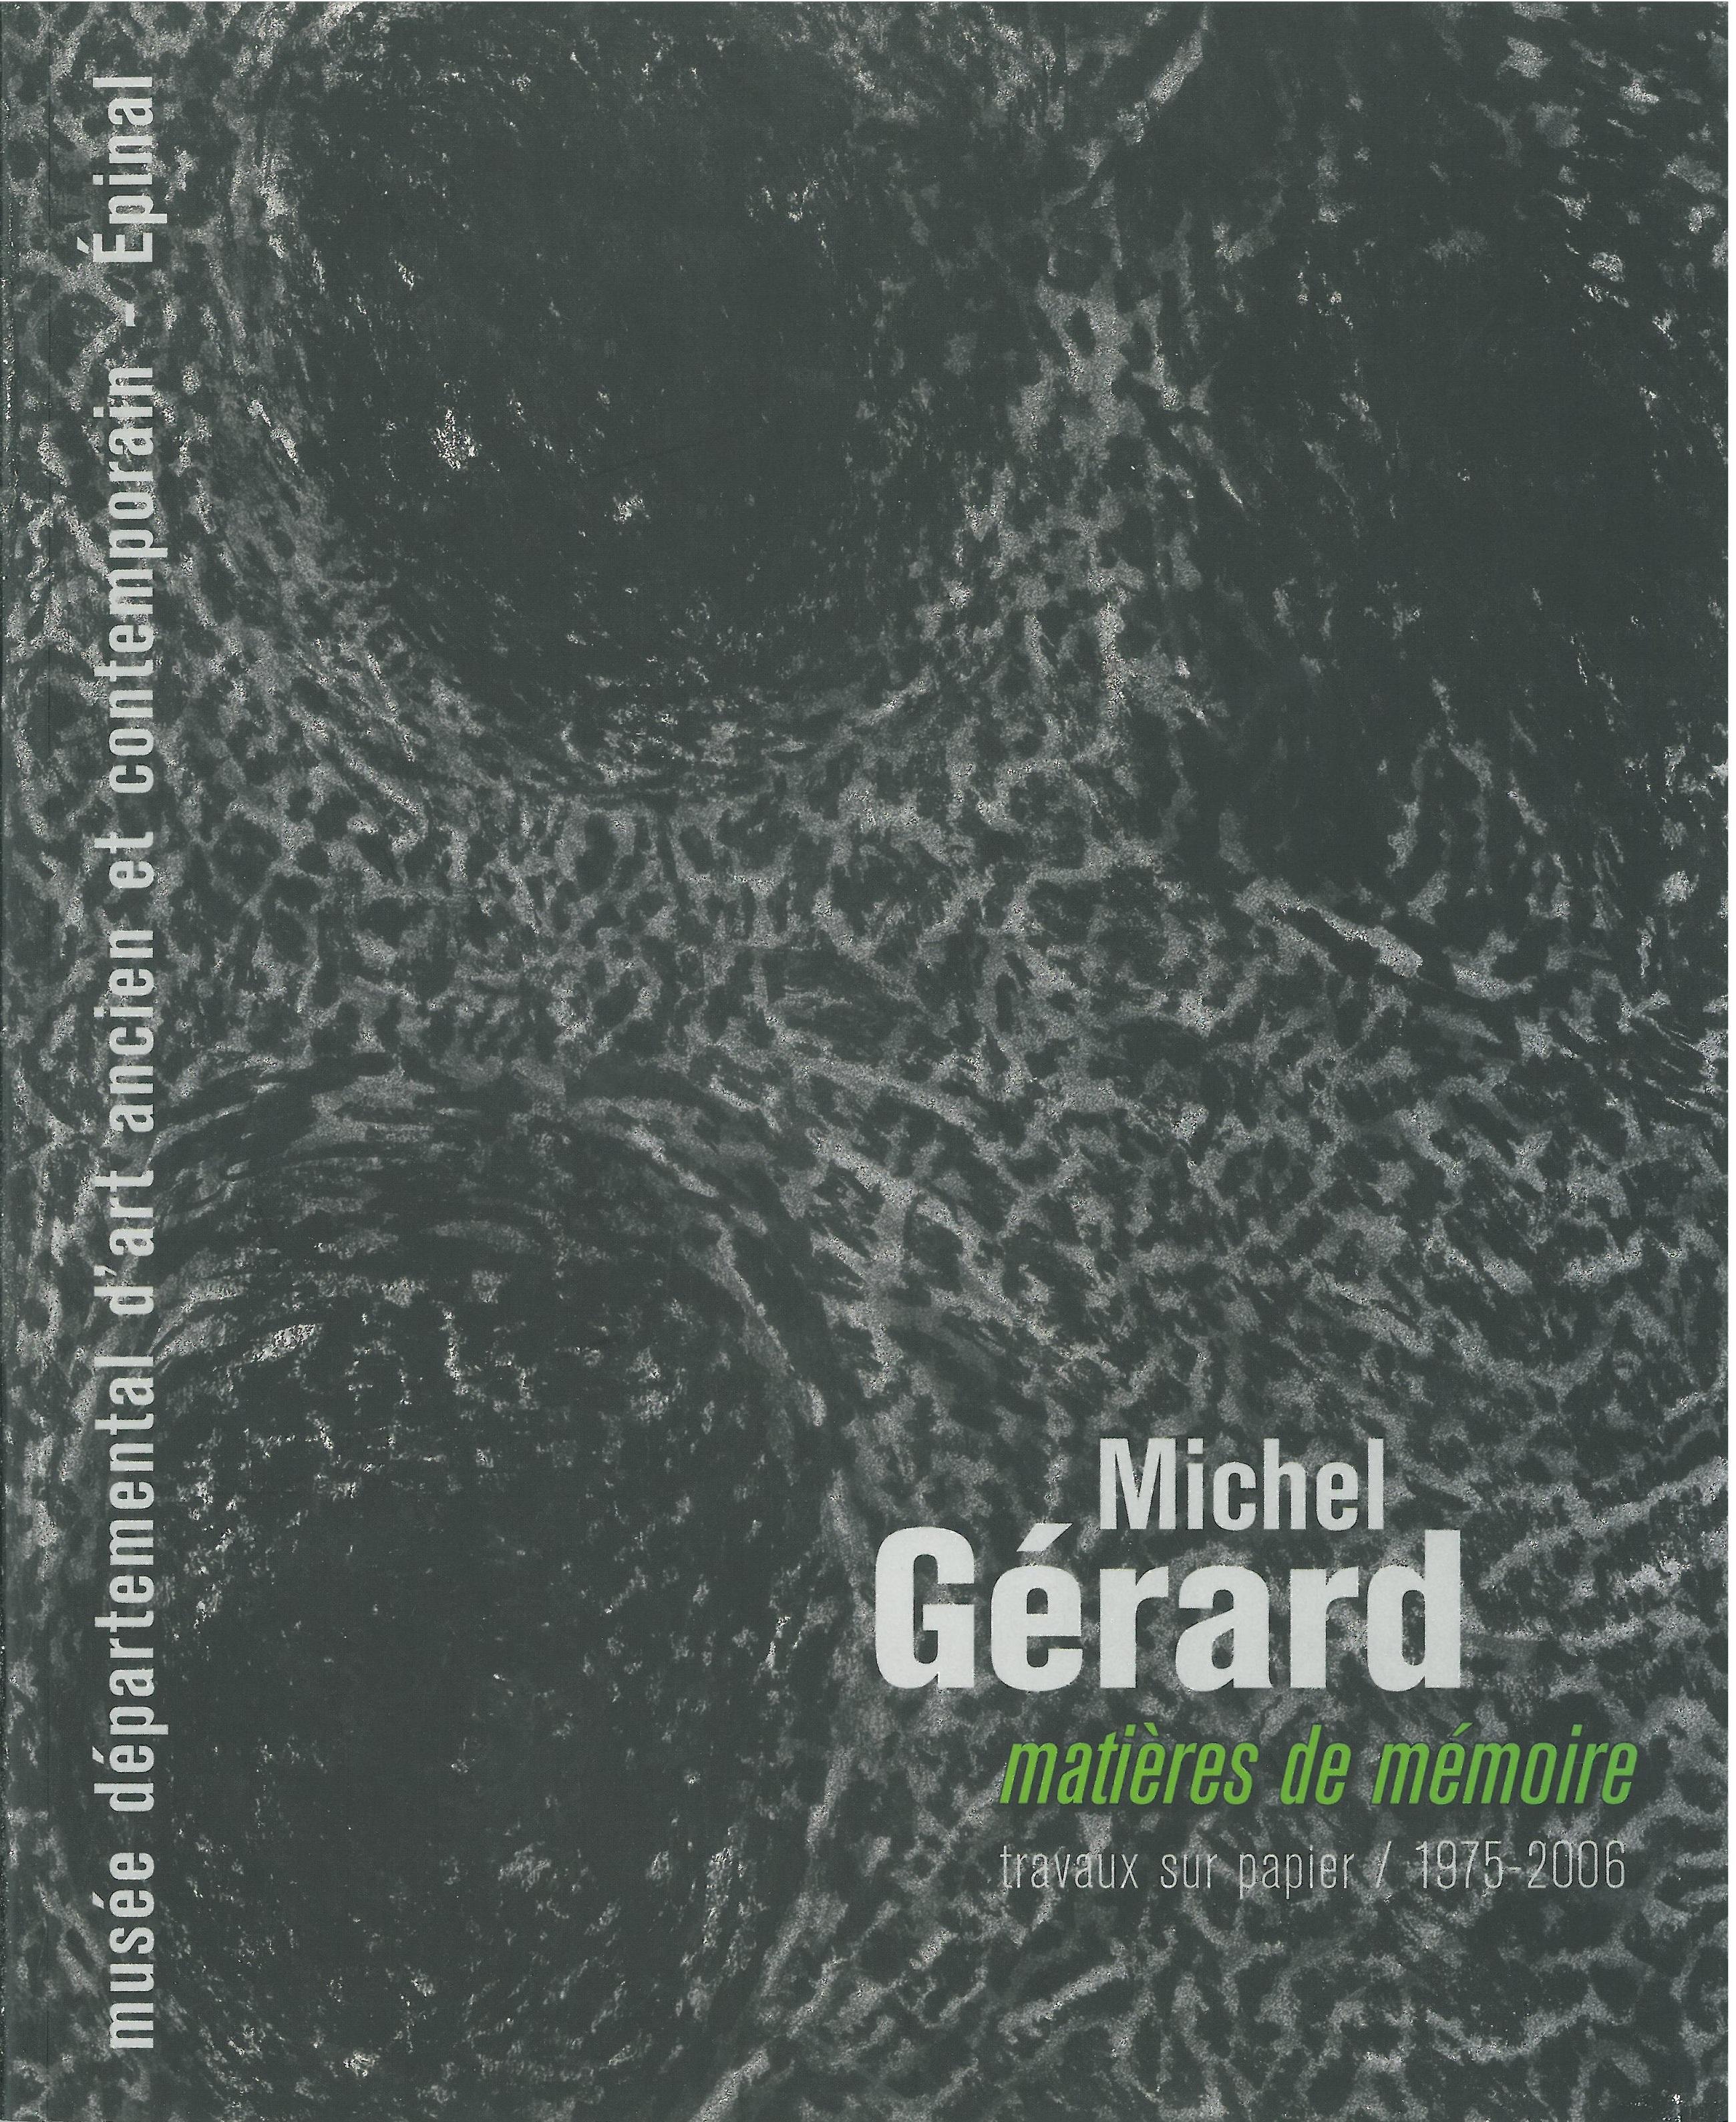 Michel Gérard 2006